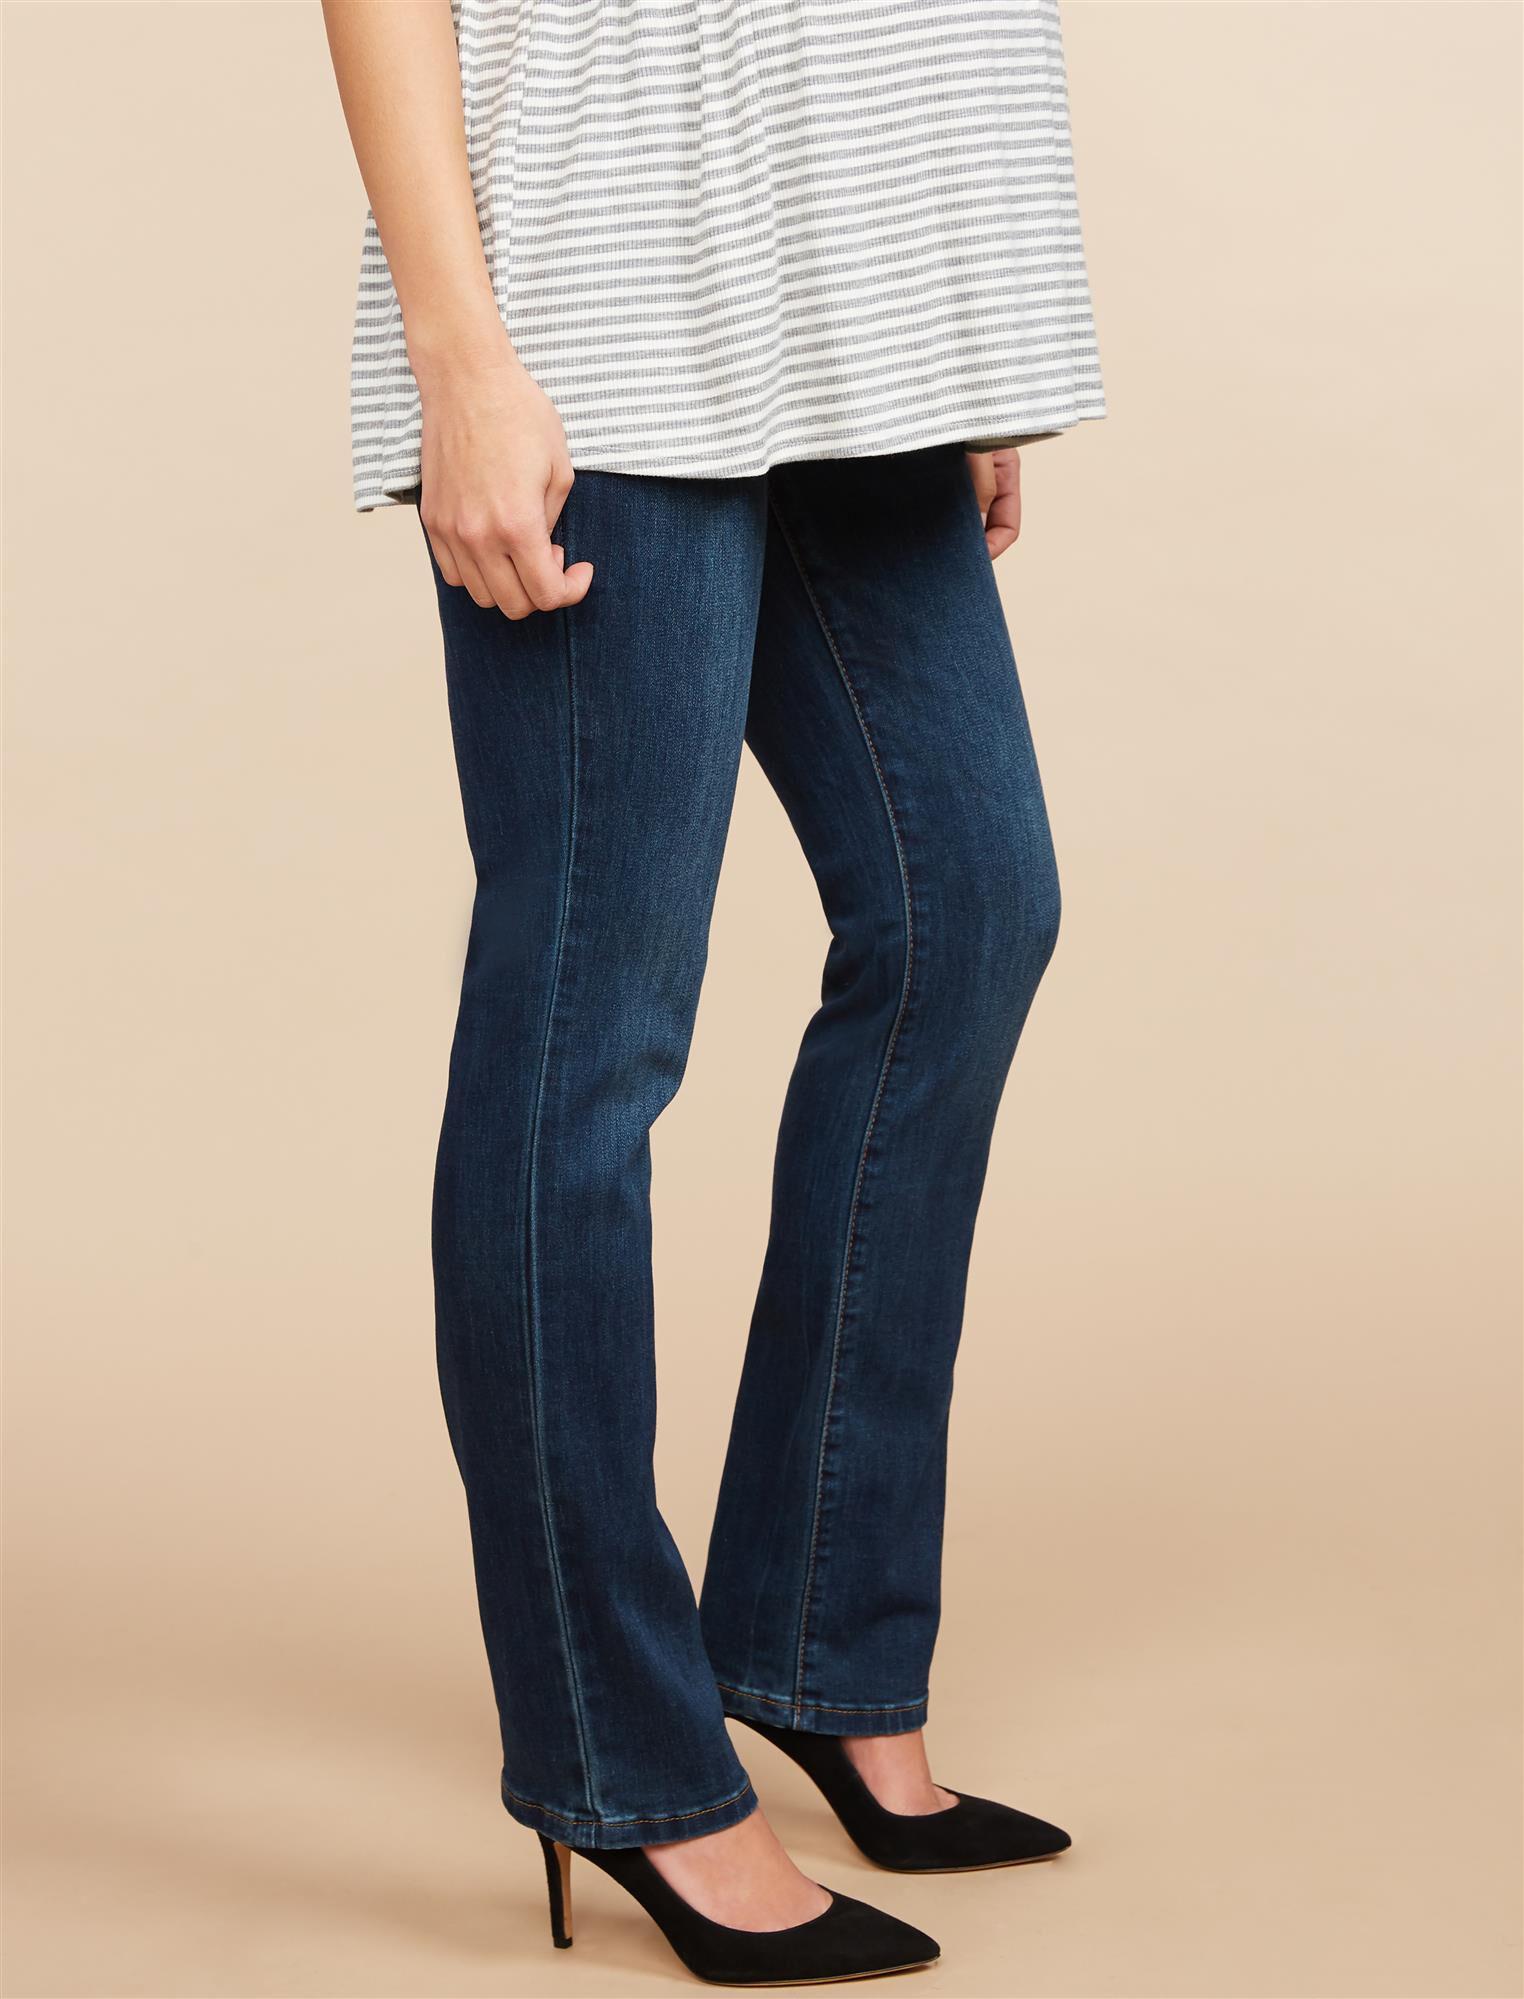 Secret Fit Belly Stretch Straight Leg Maternity Jeans